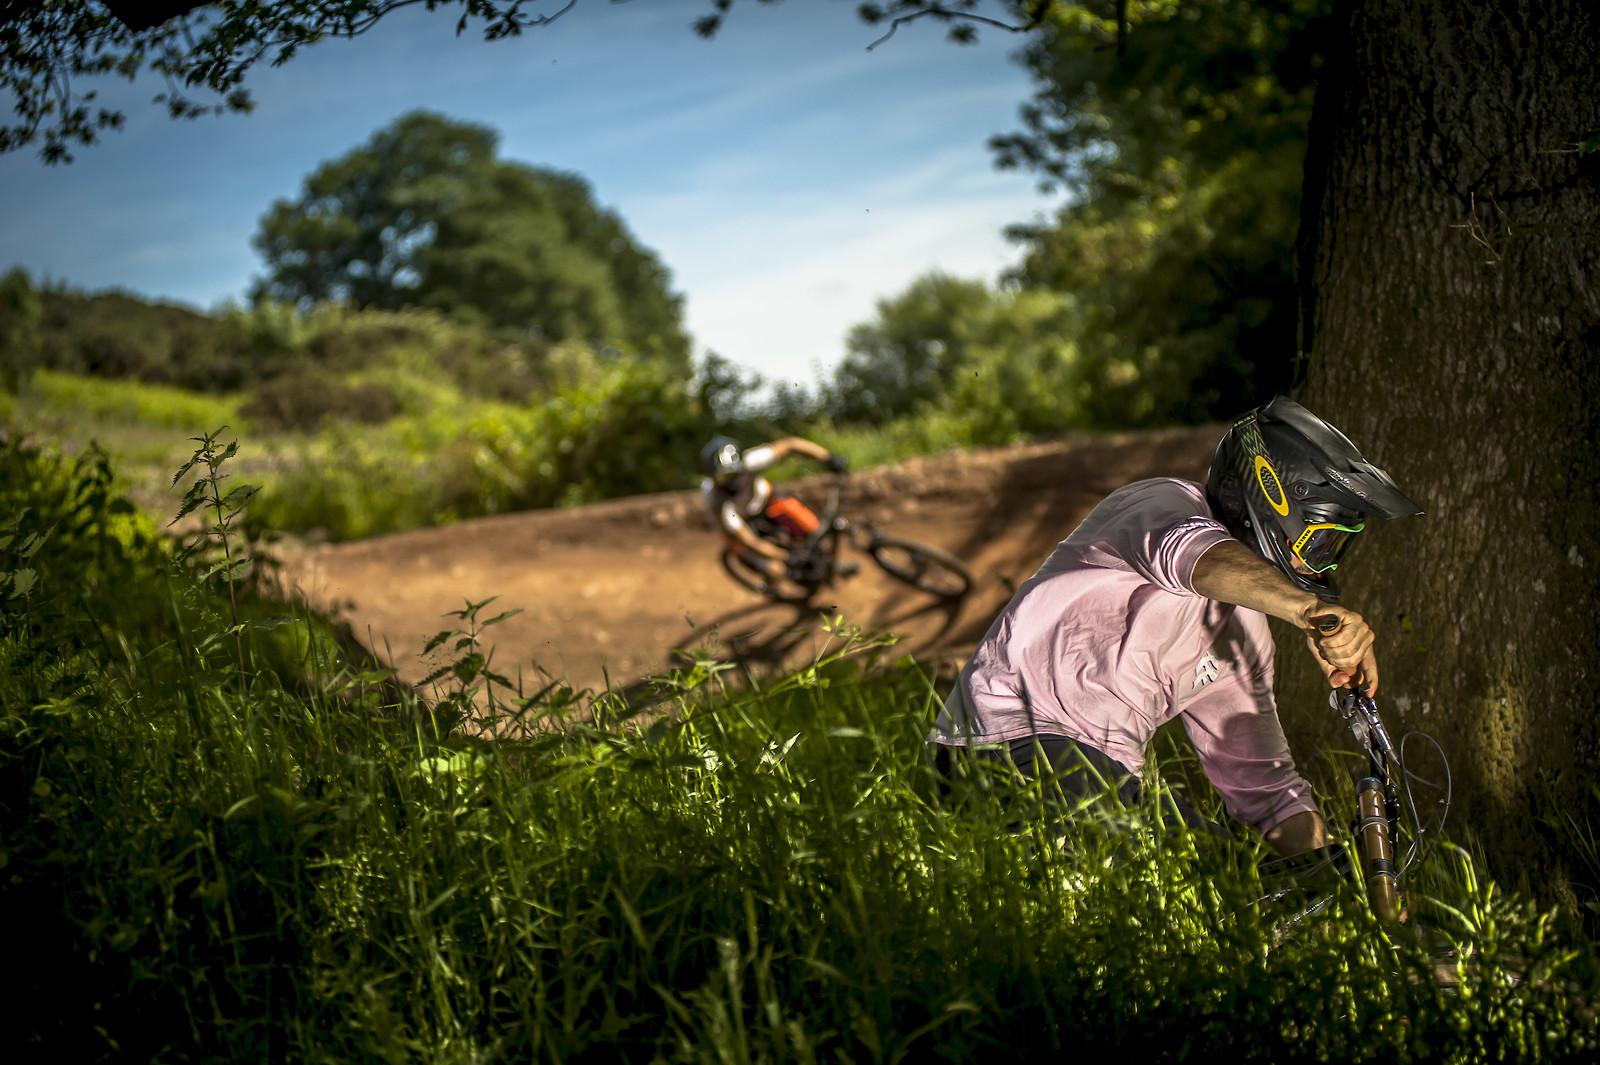 DSC0943 - robbarkerimages2017 - Mountain Biking Pictures - Vital MTB